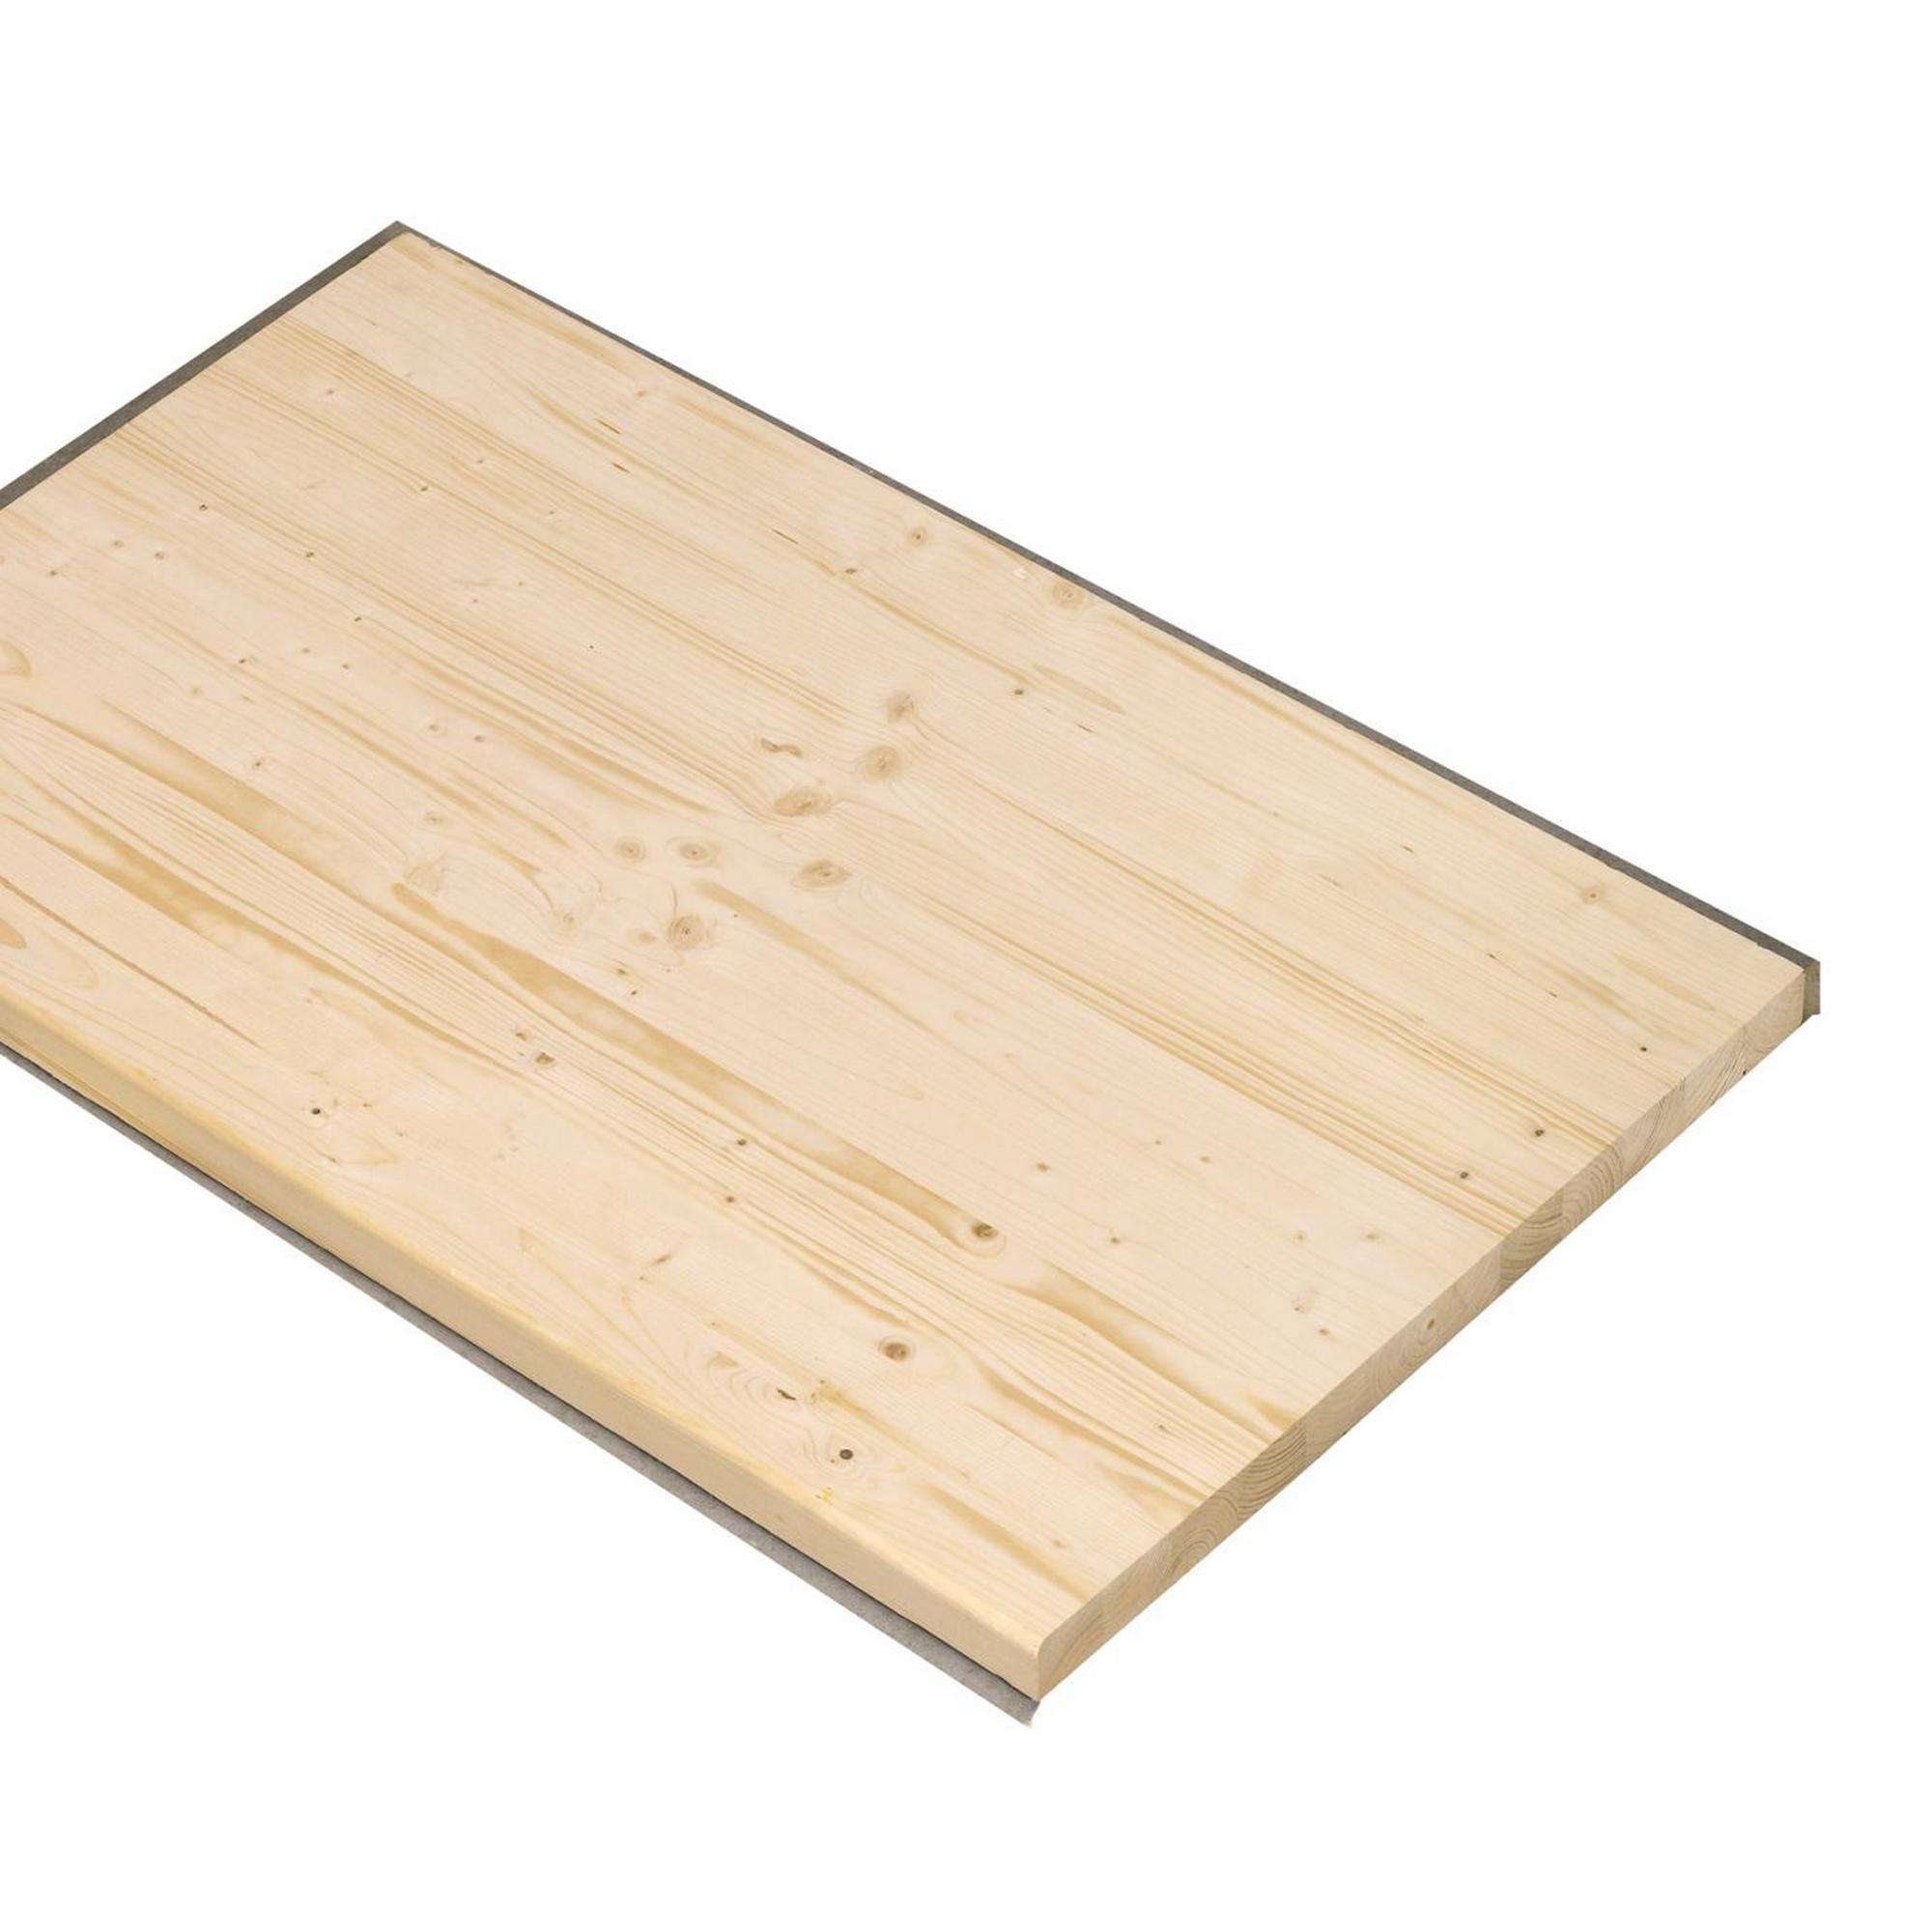 Arbeitsplatte küche toom  Massivholz-Arbeitsplatte 3000x600x27mm | toom Baumarkt